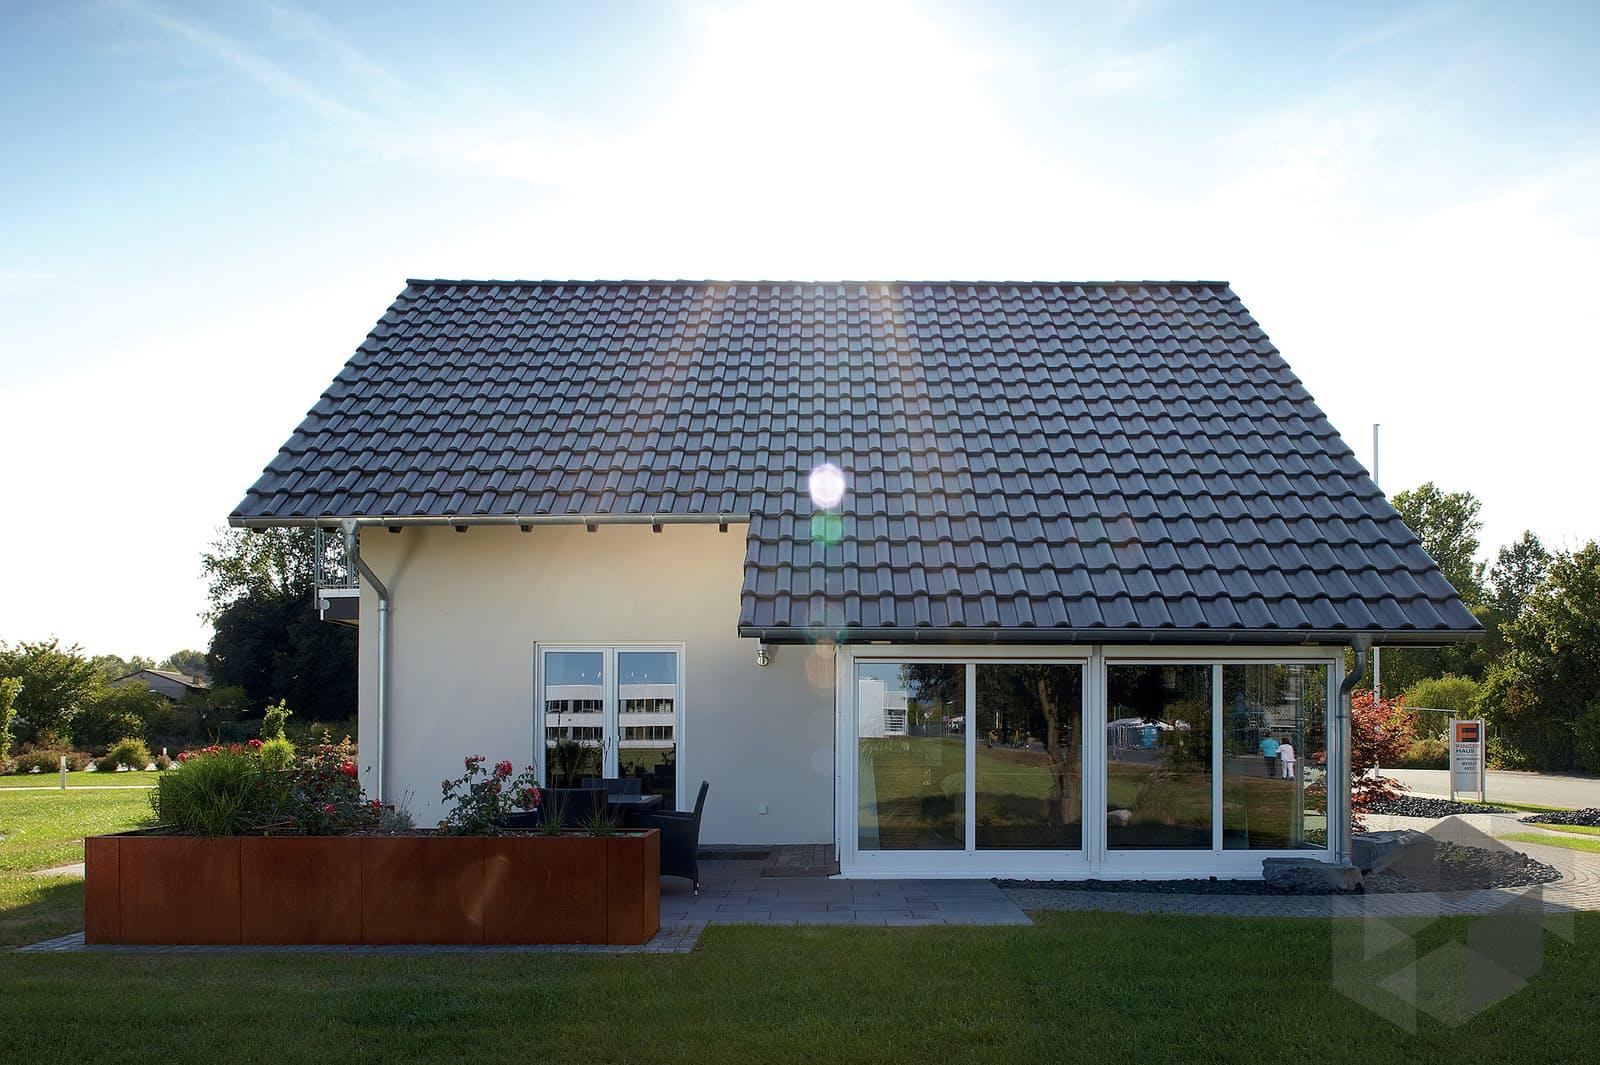 medley 200 b musterhaus frankenberg von fingerhaus komplette daten bersicht. Black Bedroom Furniture Sets. Home Design Ideas